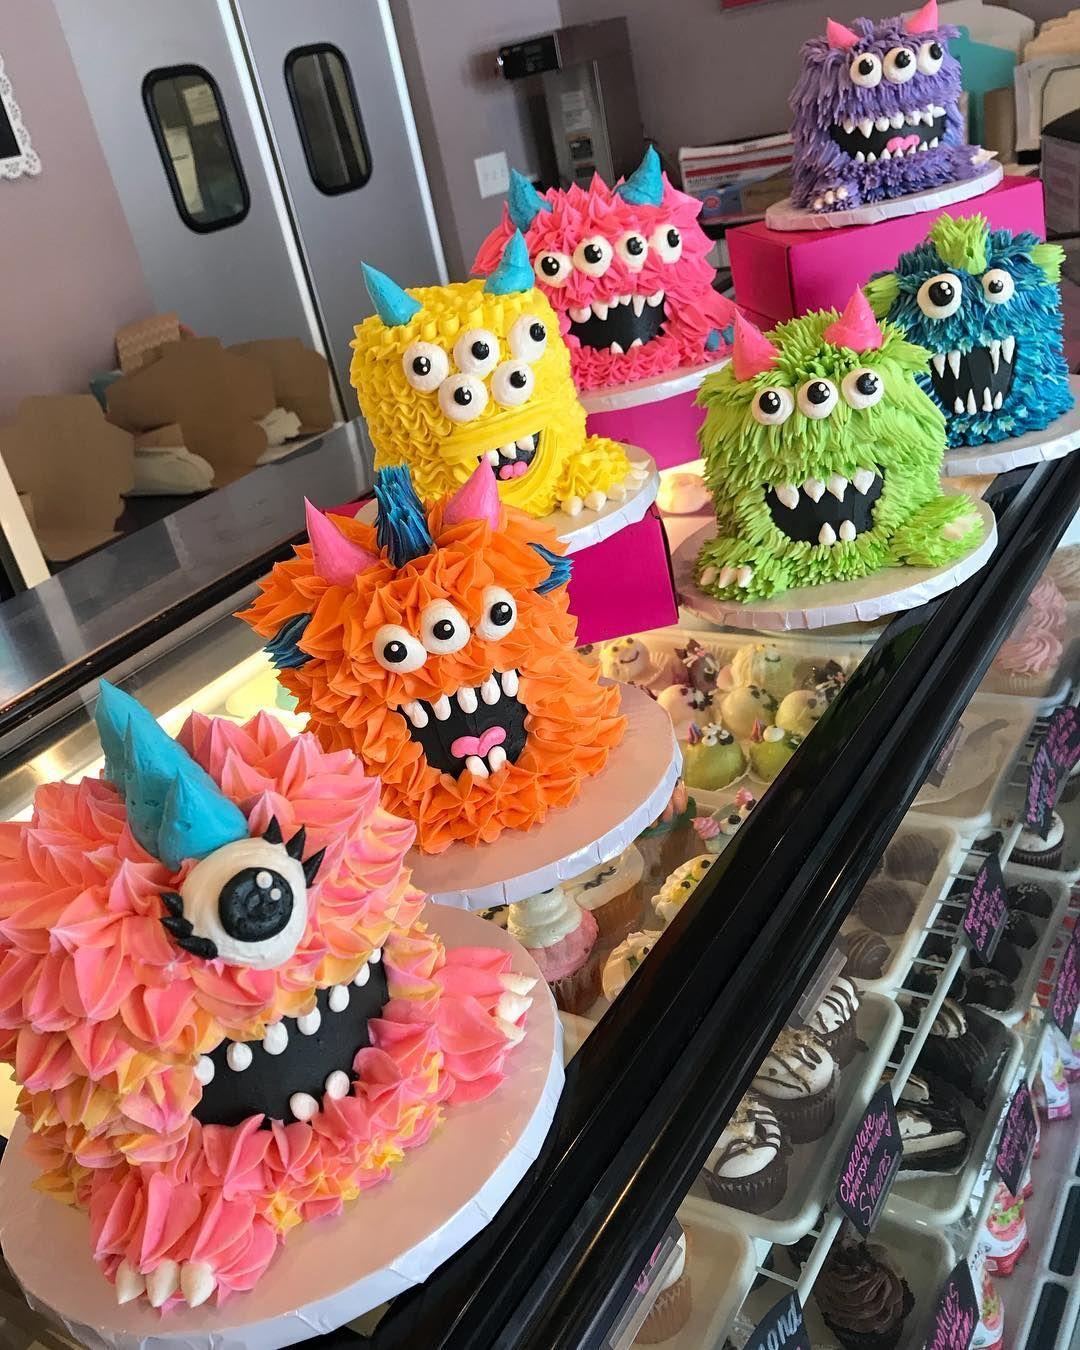 Peachy Monster Cake Whiteflowercakeshoppe White Flower Cake Shoppe Funny Birthday Cards Online Inifofree Goldxyz